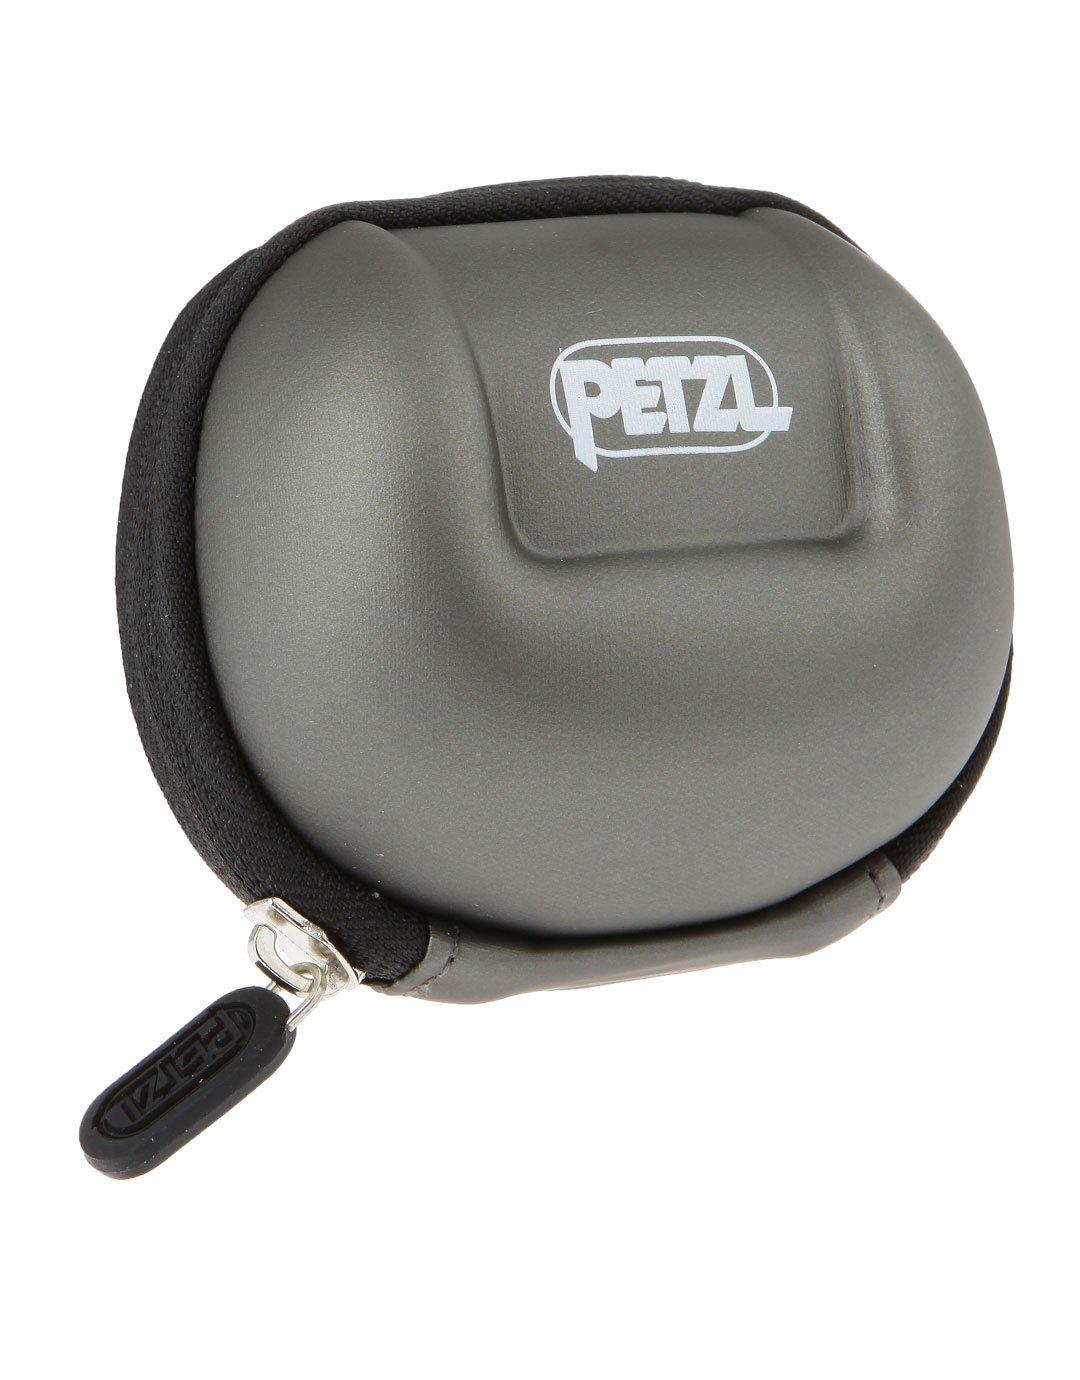 Petzl Adult Protective Case Poche Tikka 2, Gris, Talla Única, E93990